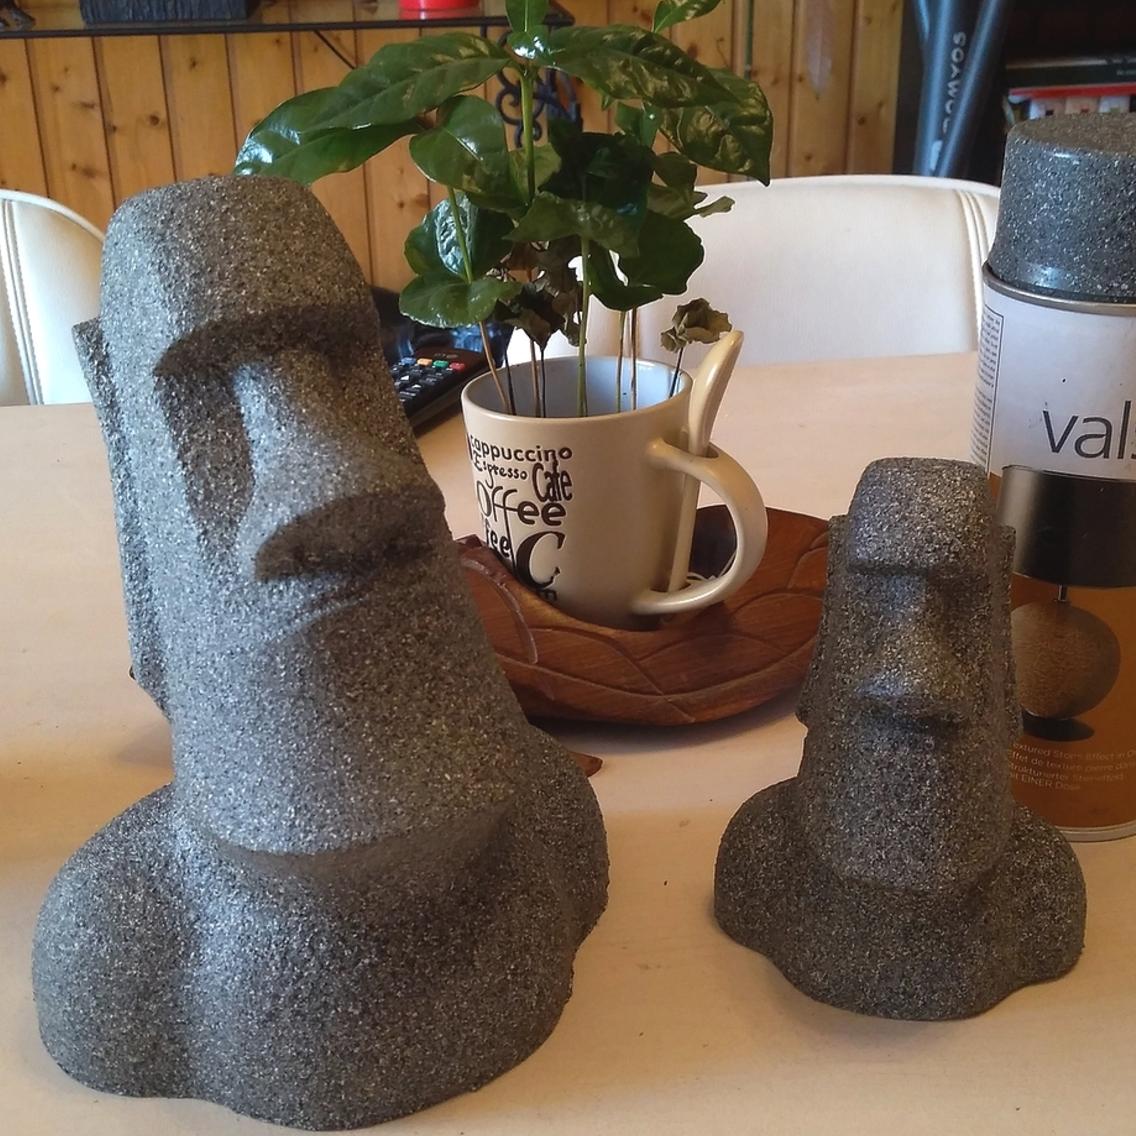 Capture d'écran 2017-08-21 à 11.50.34.png Download free STL file Moai statue -No overhang • 3D print model, Julien_DaCosta